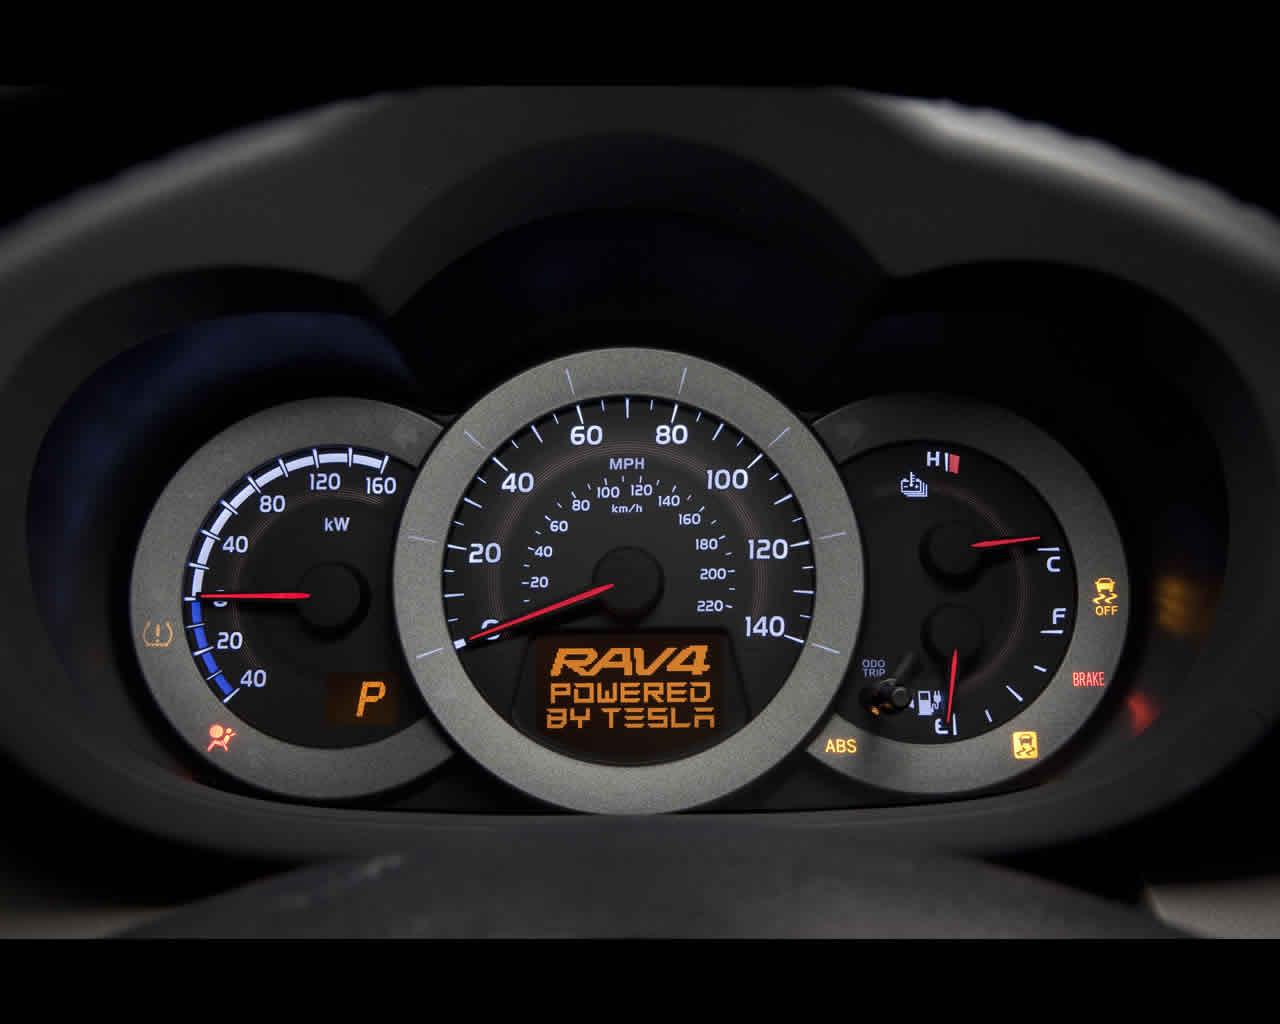 toyota rav 4 electric car 2011 and 1996 green rav4